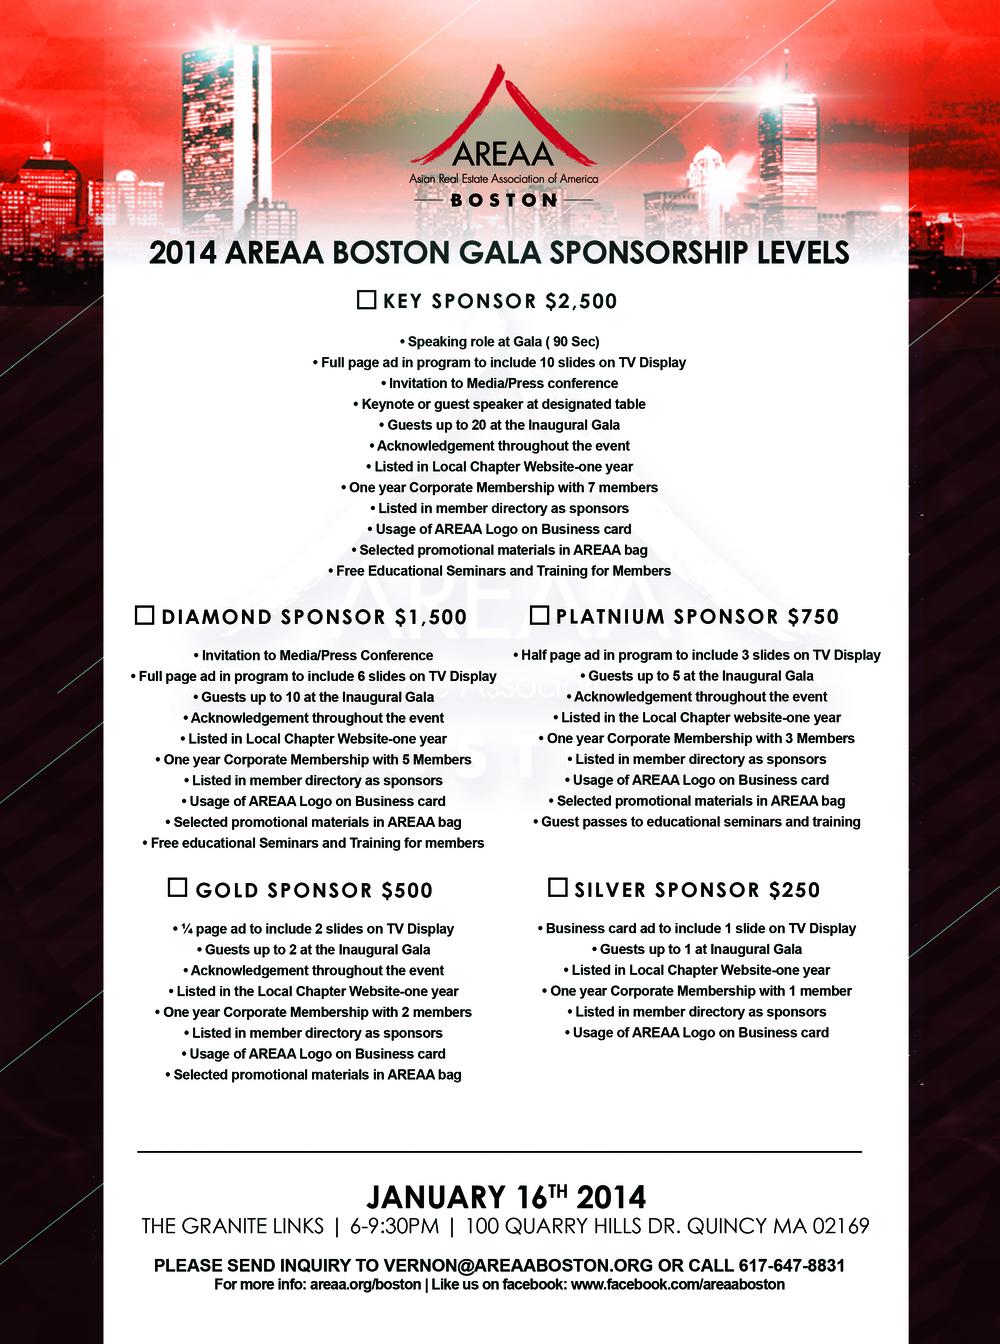 Areaa Boston Sponsorship2014 (2).jpg